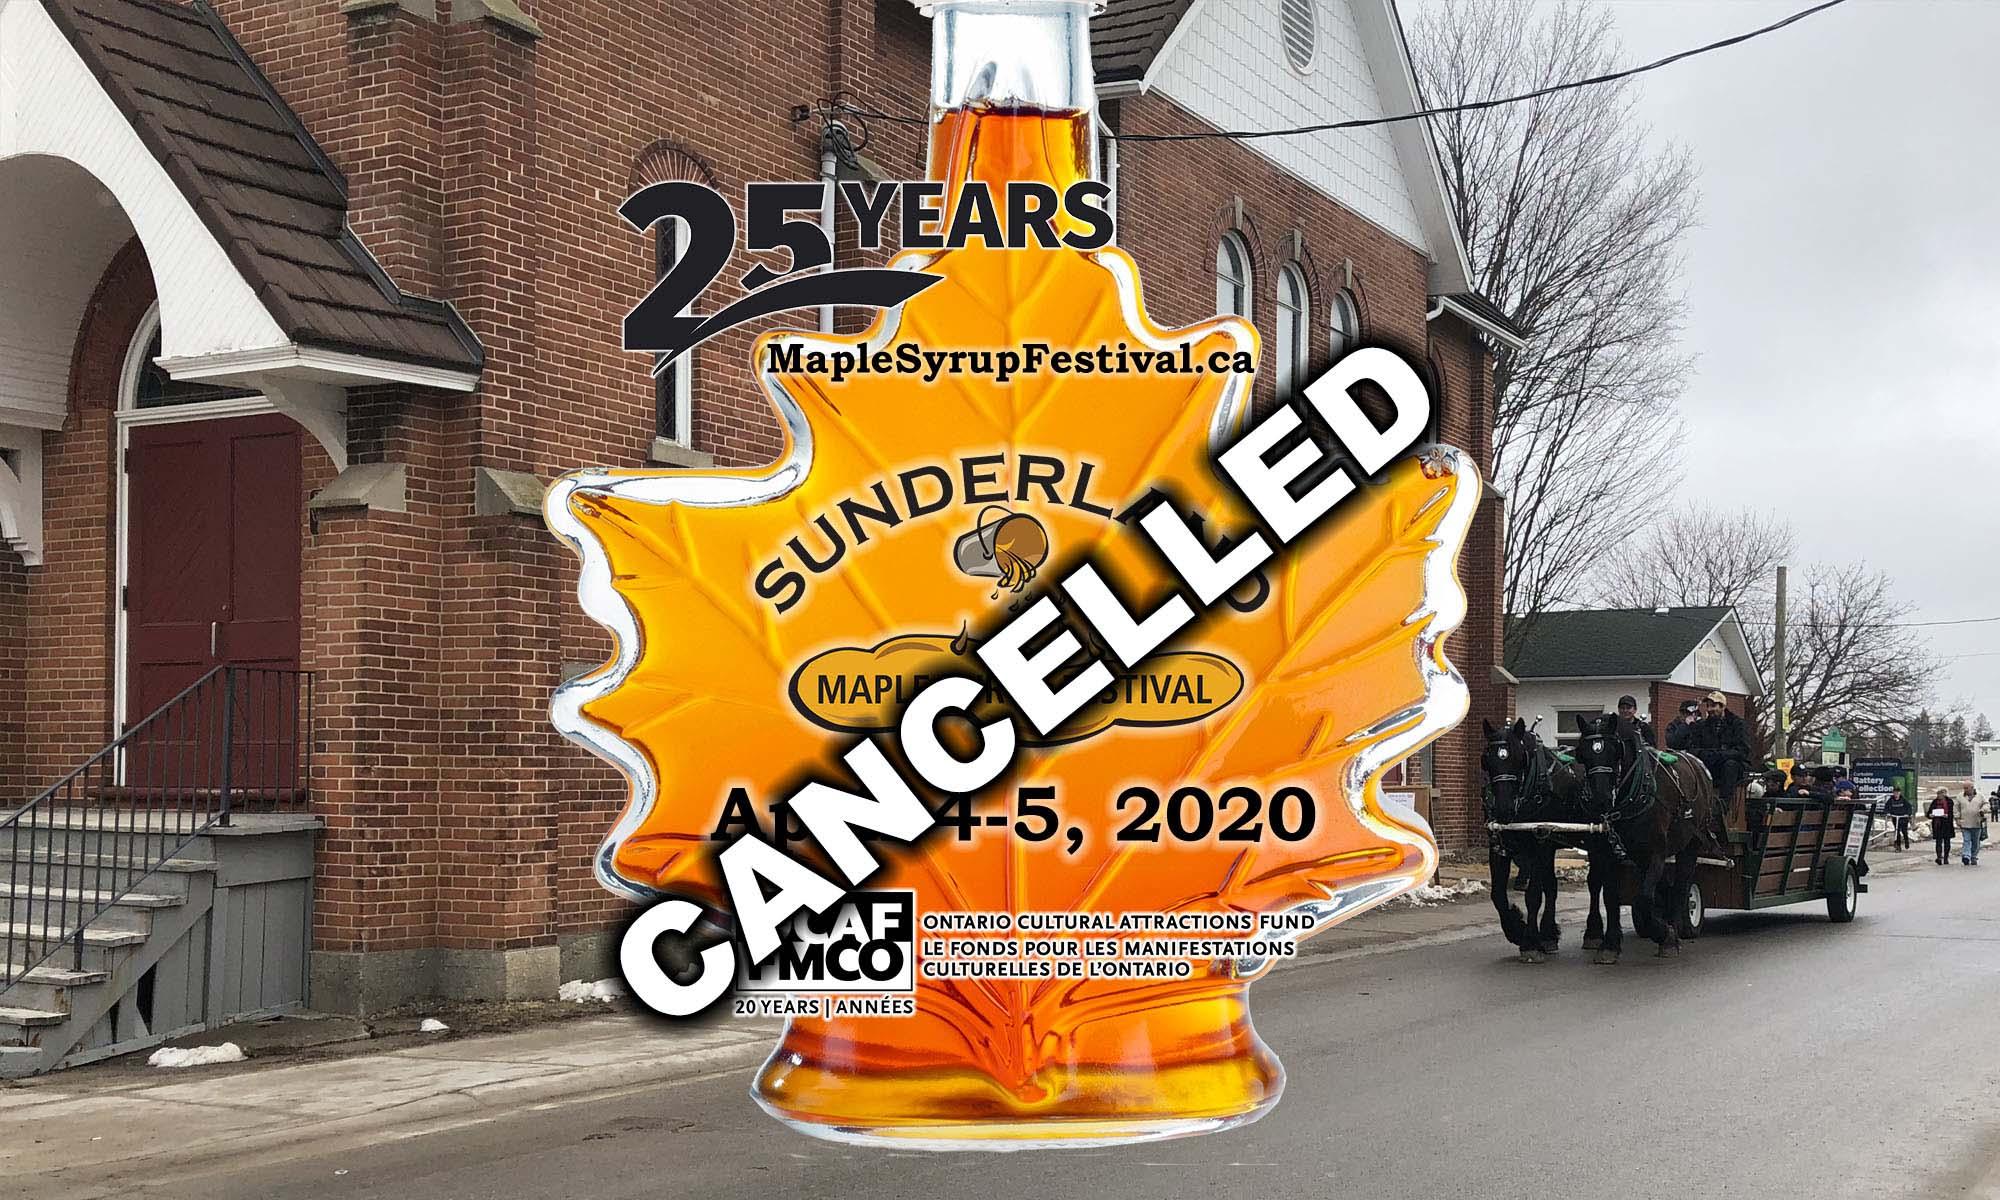 Sunderland Maple Syrup Festival